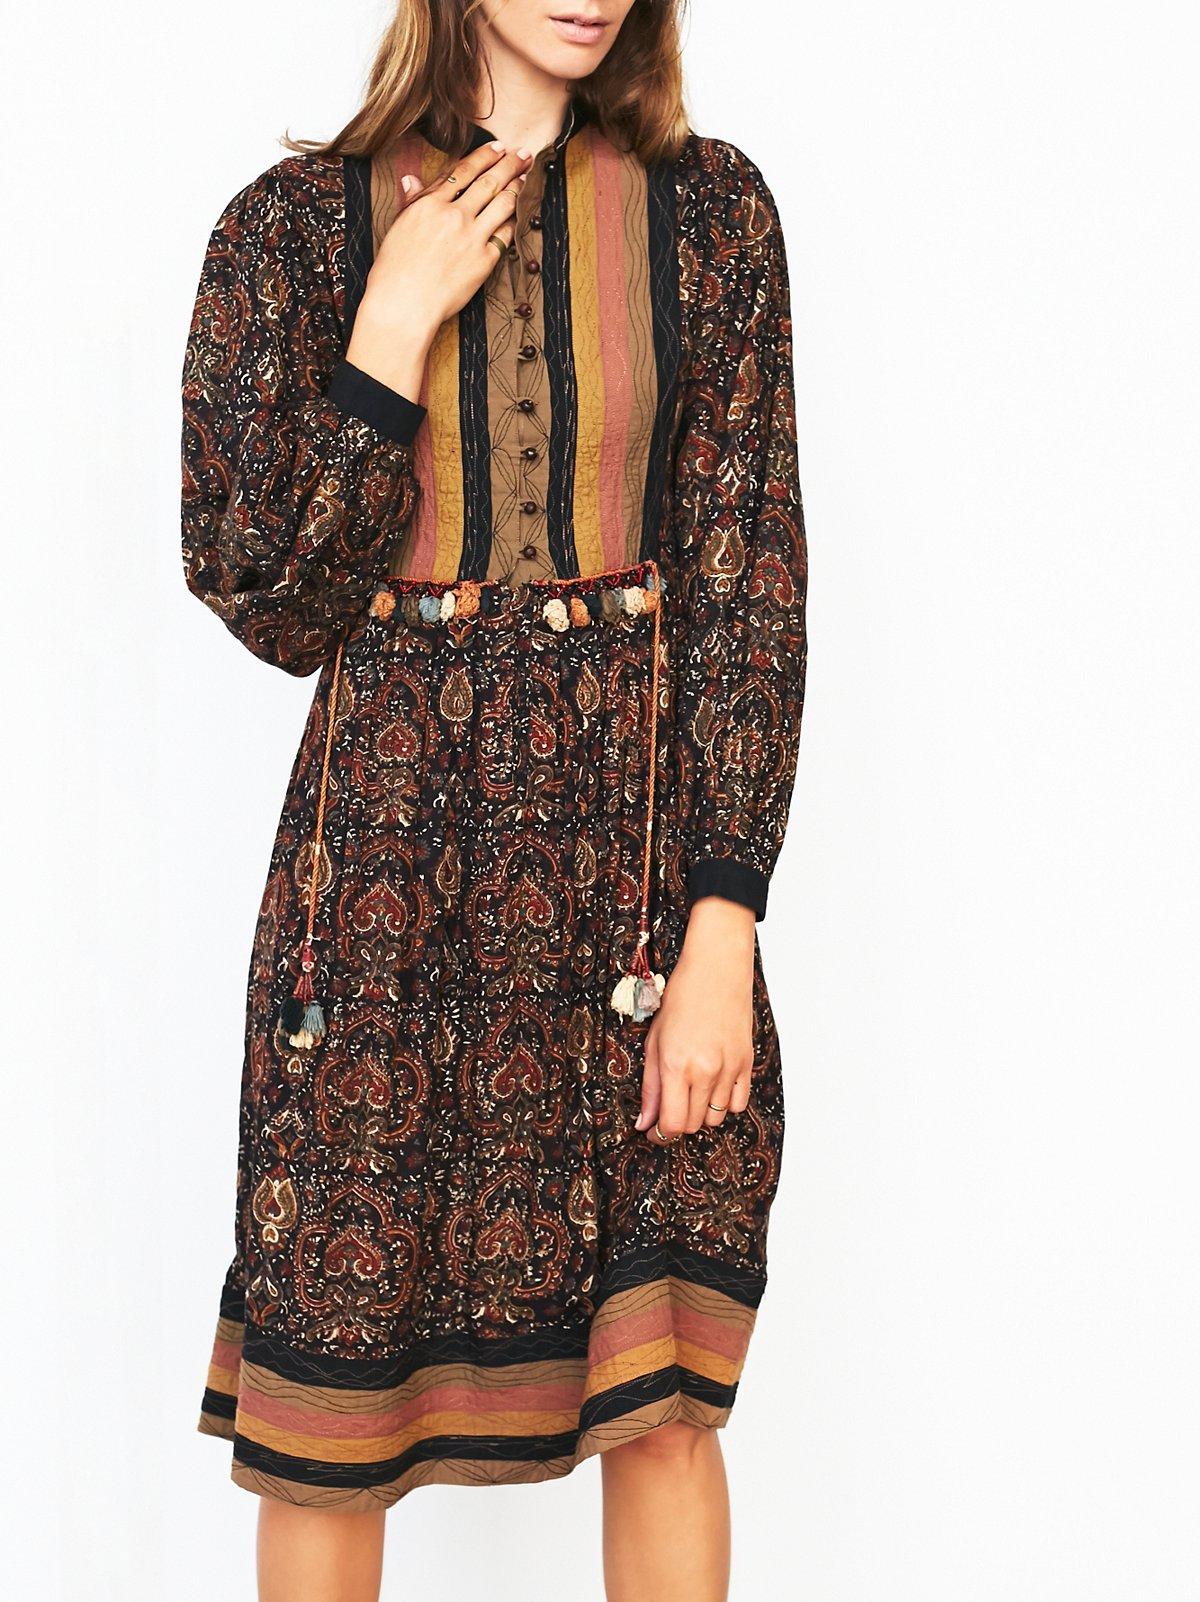 FP Vintage 70s Boho Printed Dress